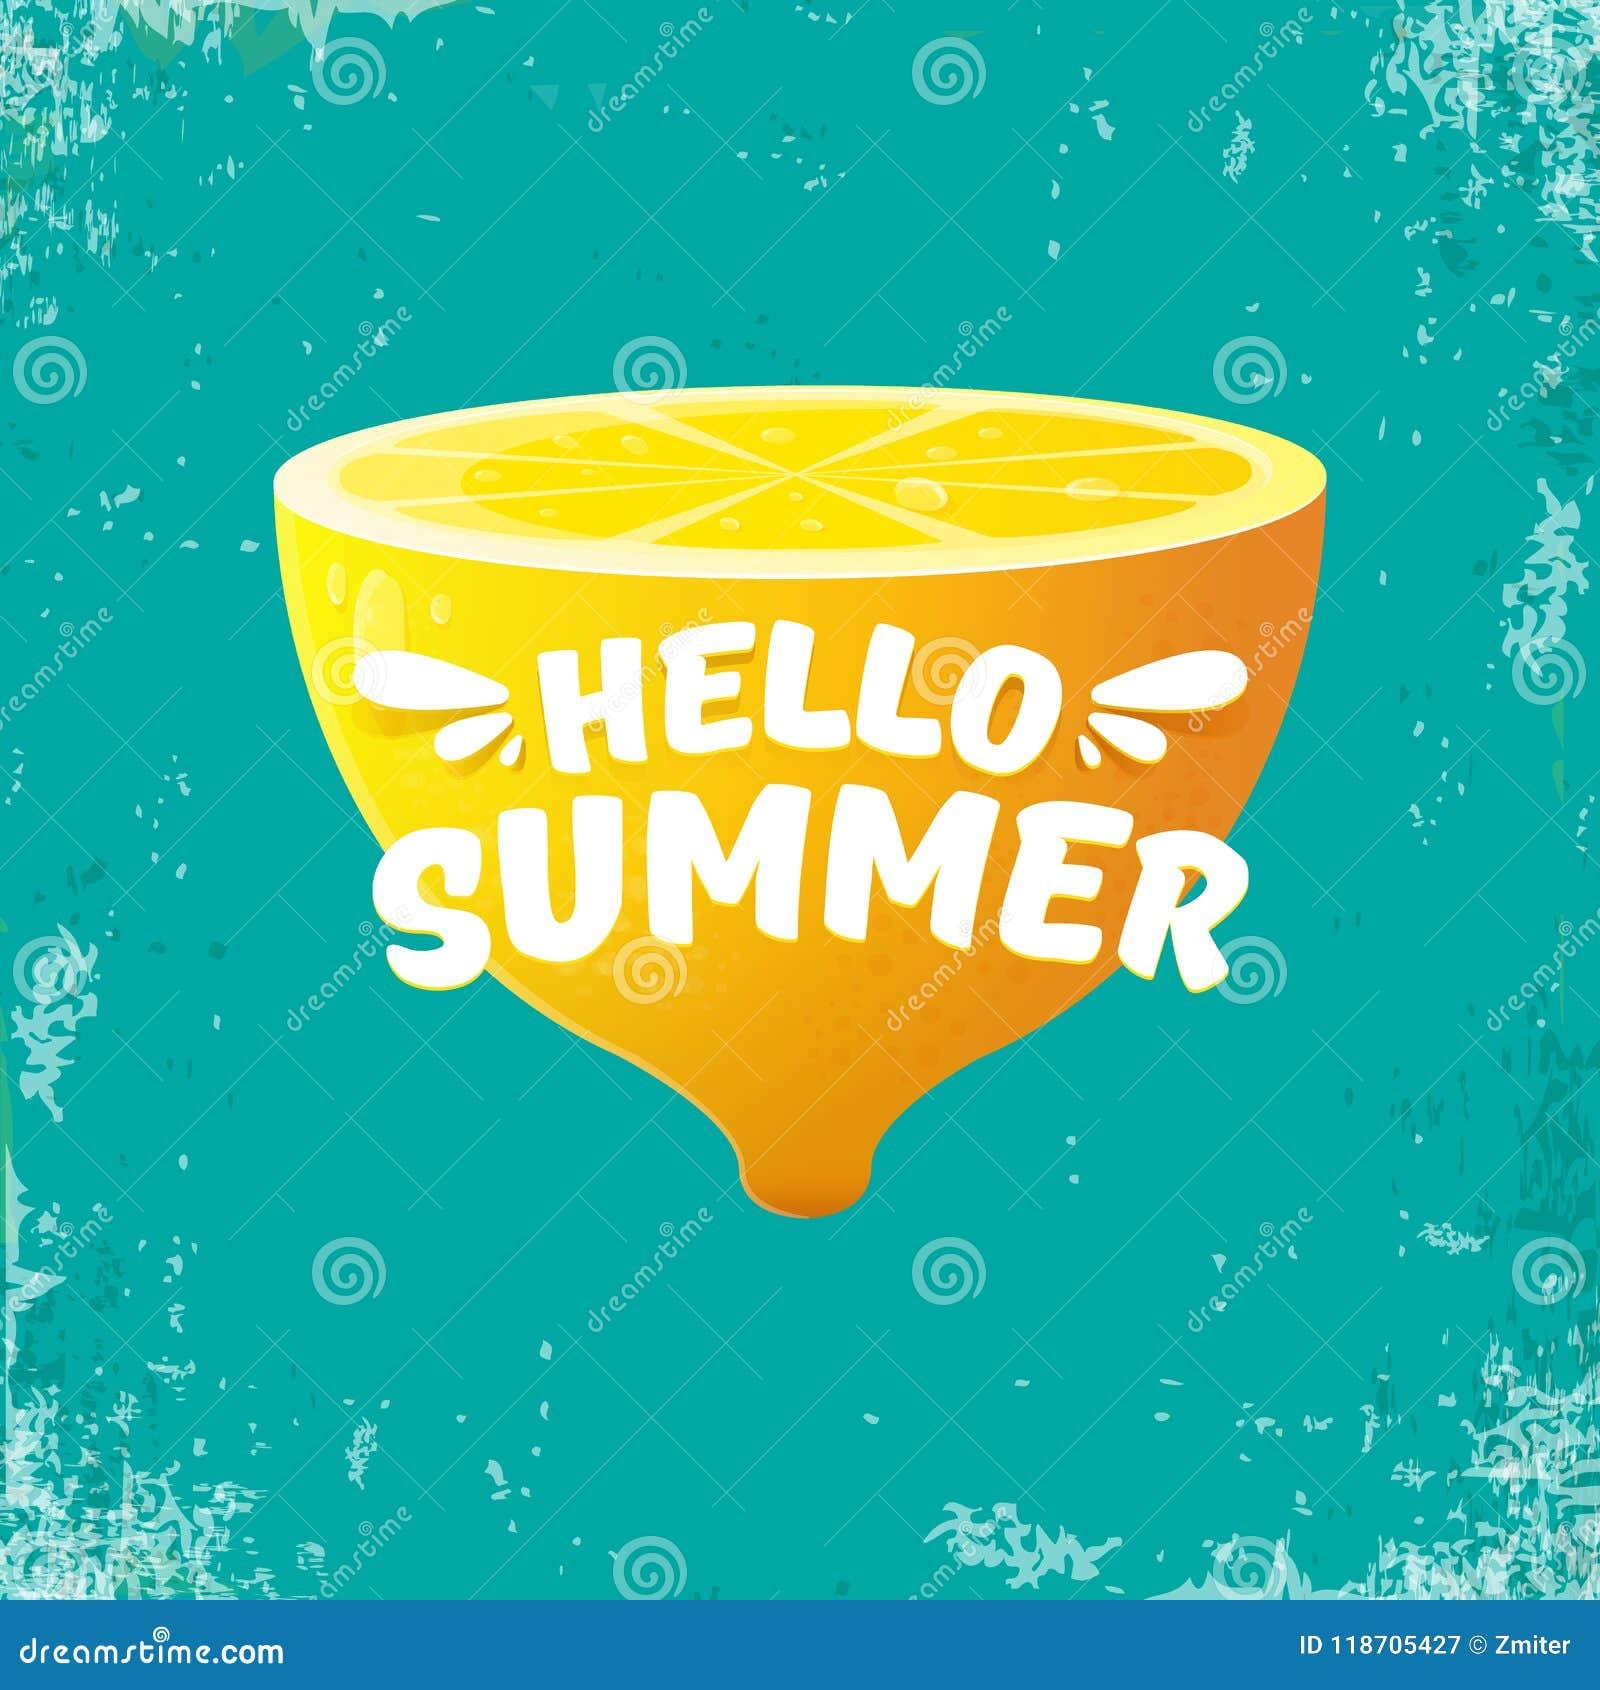 Azure Flyer Template | Vector Hello Summer Beach Party Flyer Design Template With Fresh